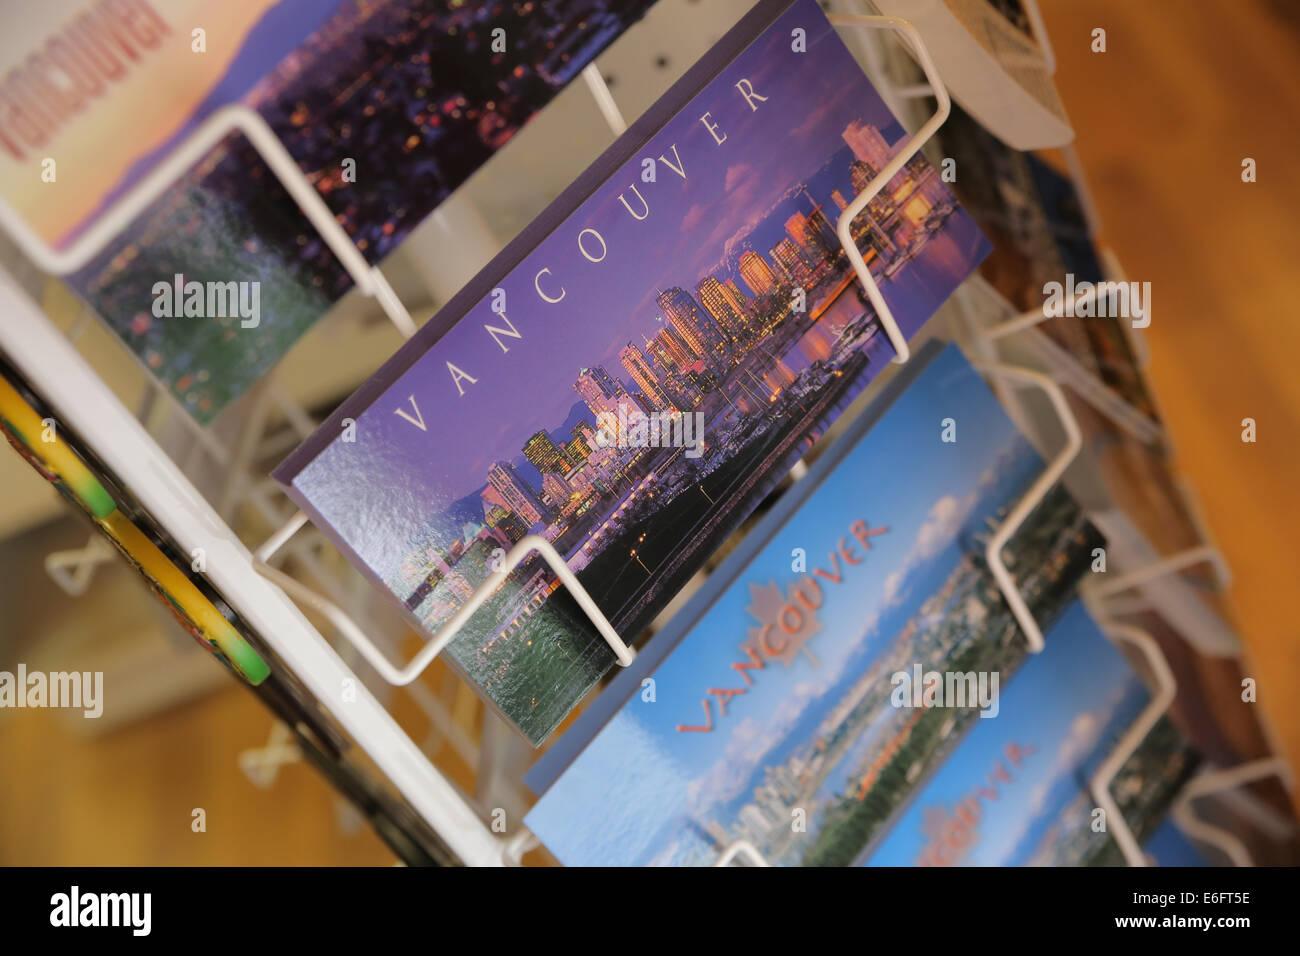 Vancouver-Postkarte-Postkarten Stockbild